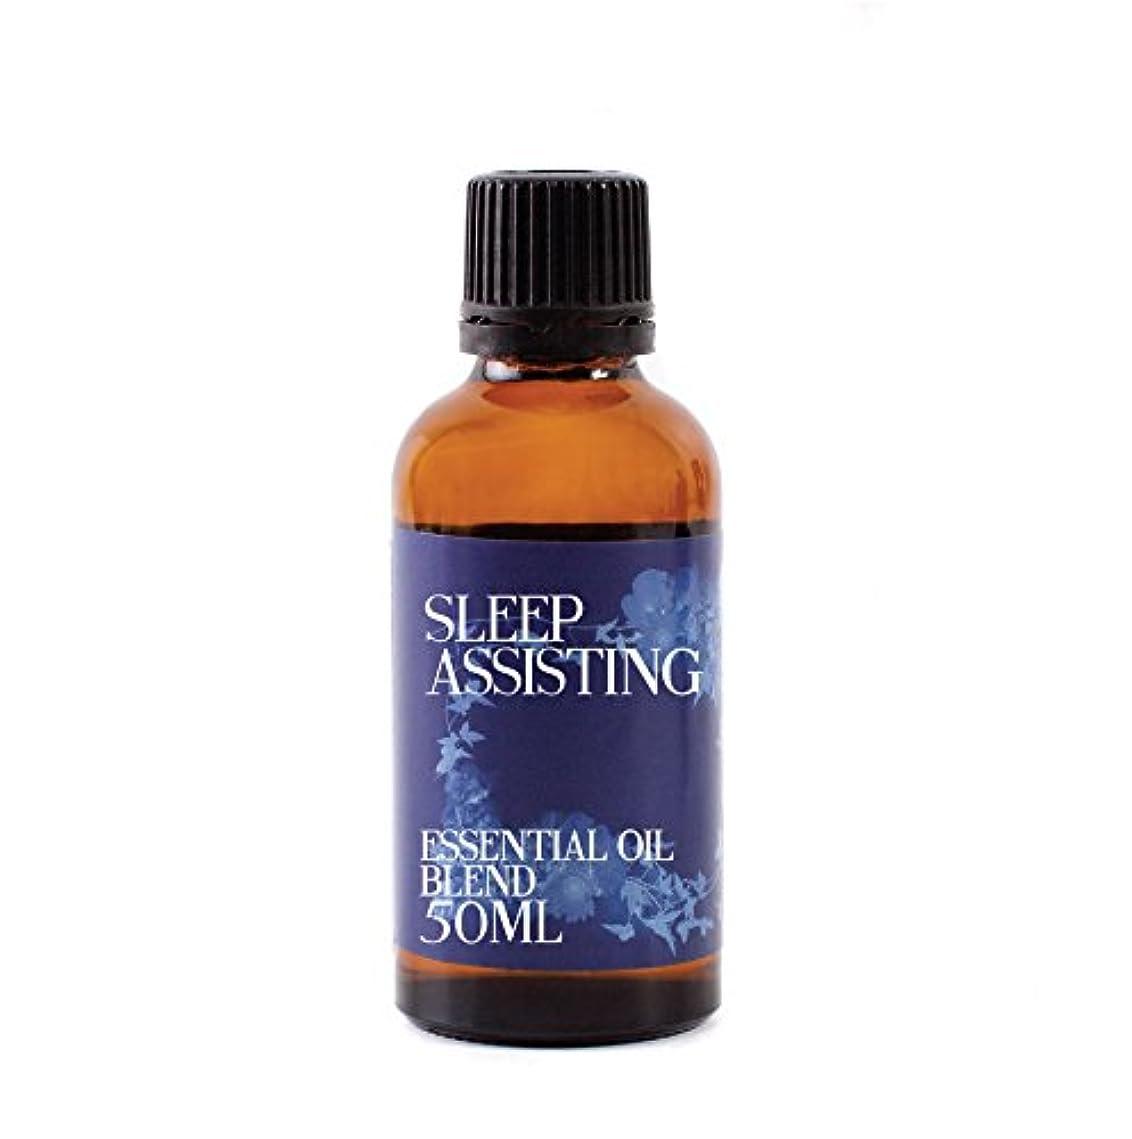 Mystix London | Sleep Assisting Essential Oil Blend - 50ml - 100% Pure